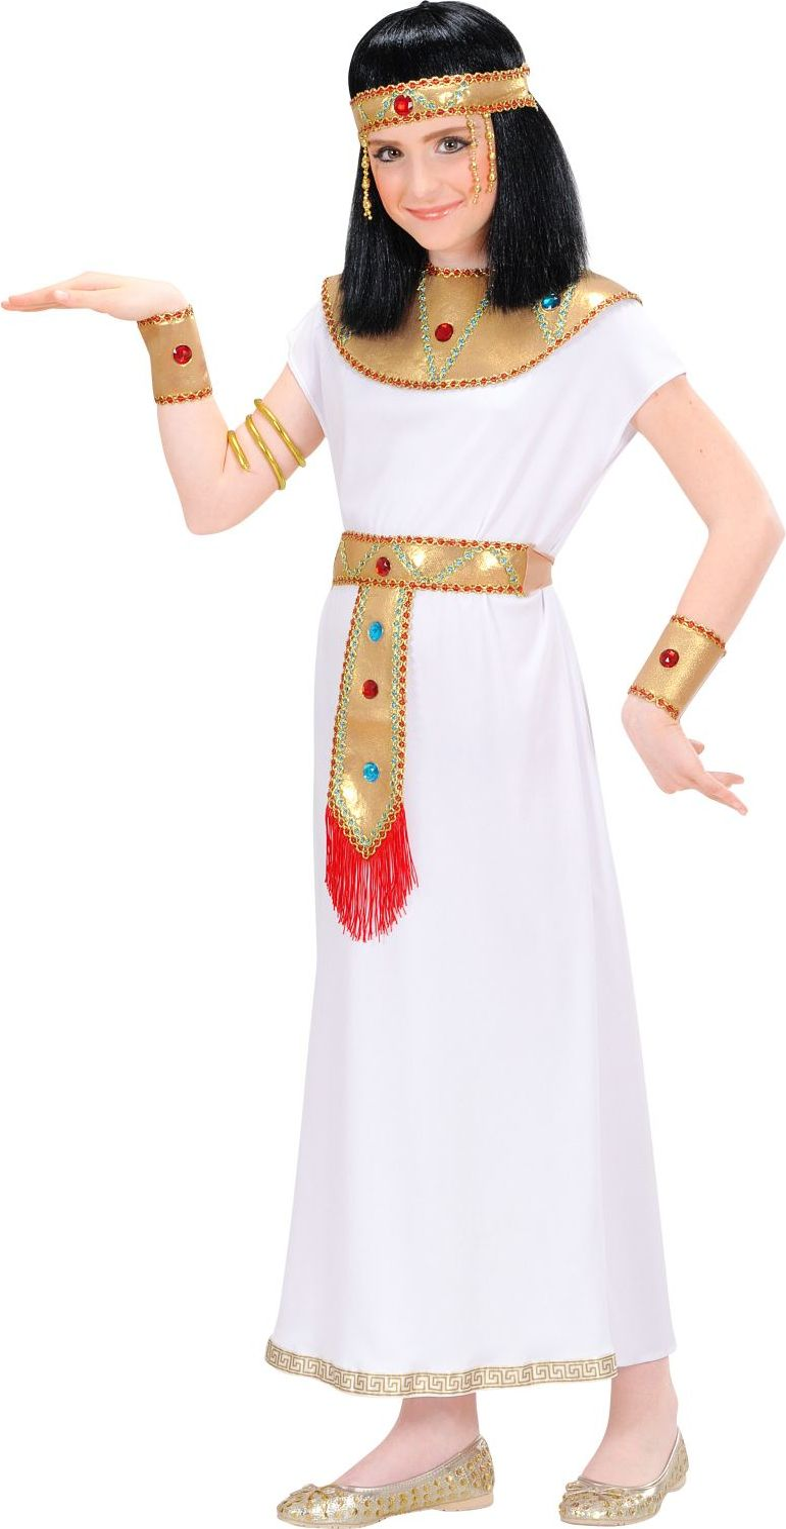 Cleopatra's kind kostuum